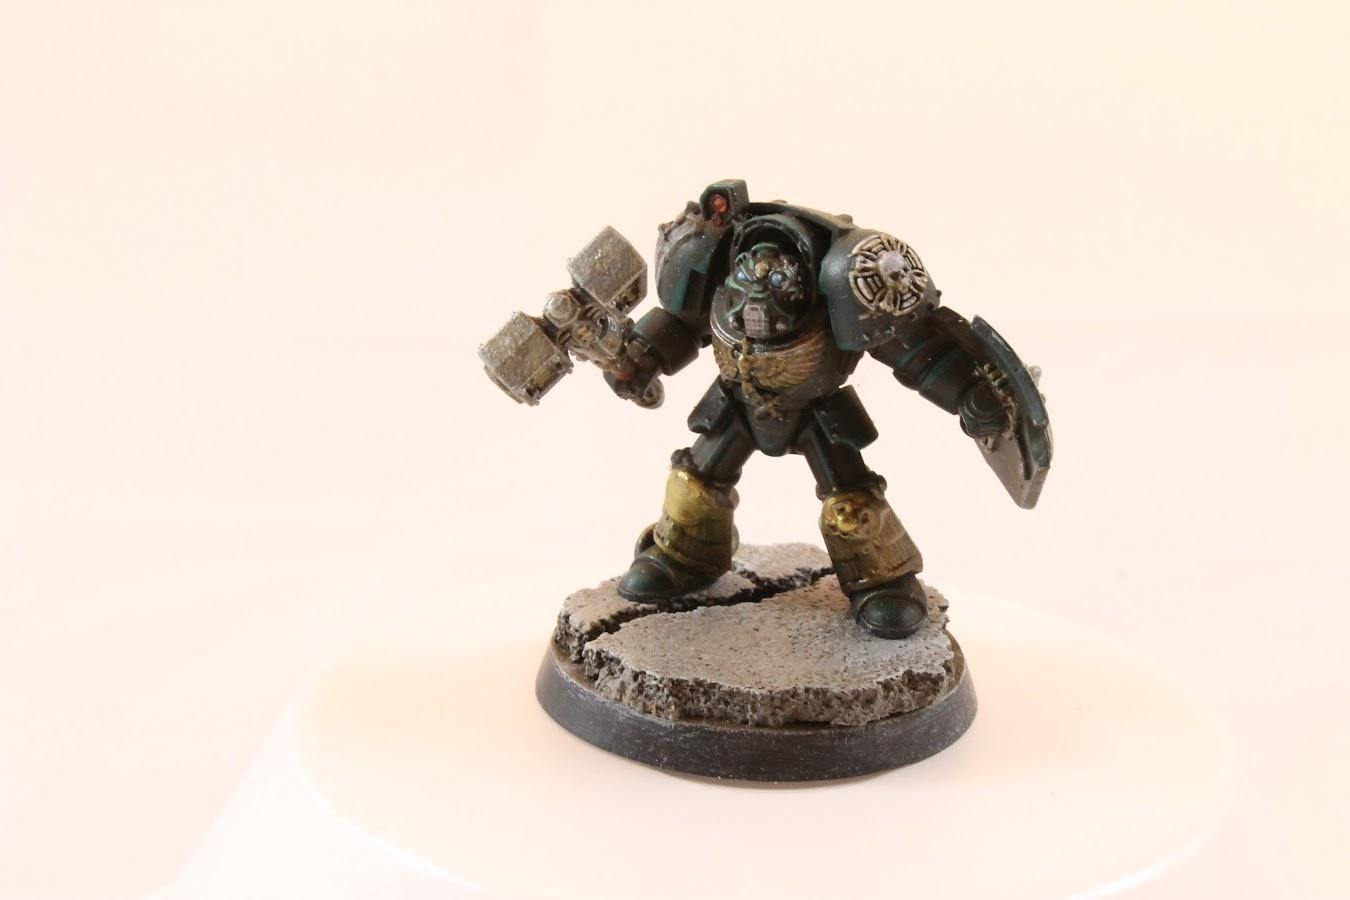 Terminator #2, painted